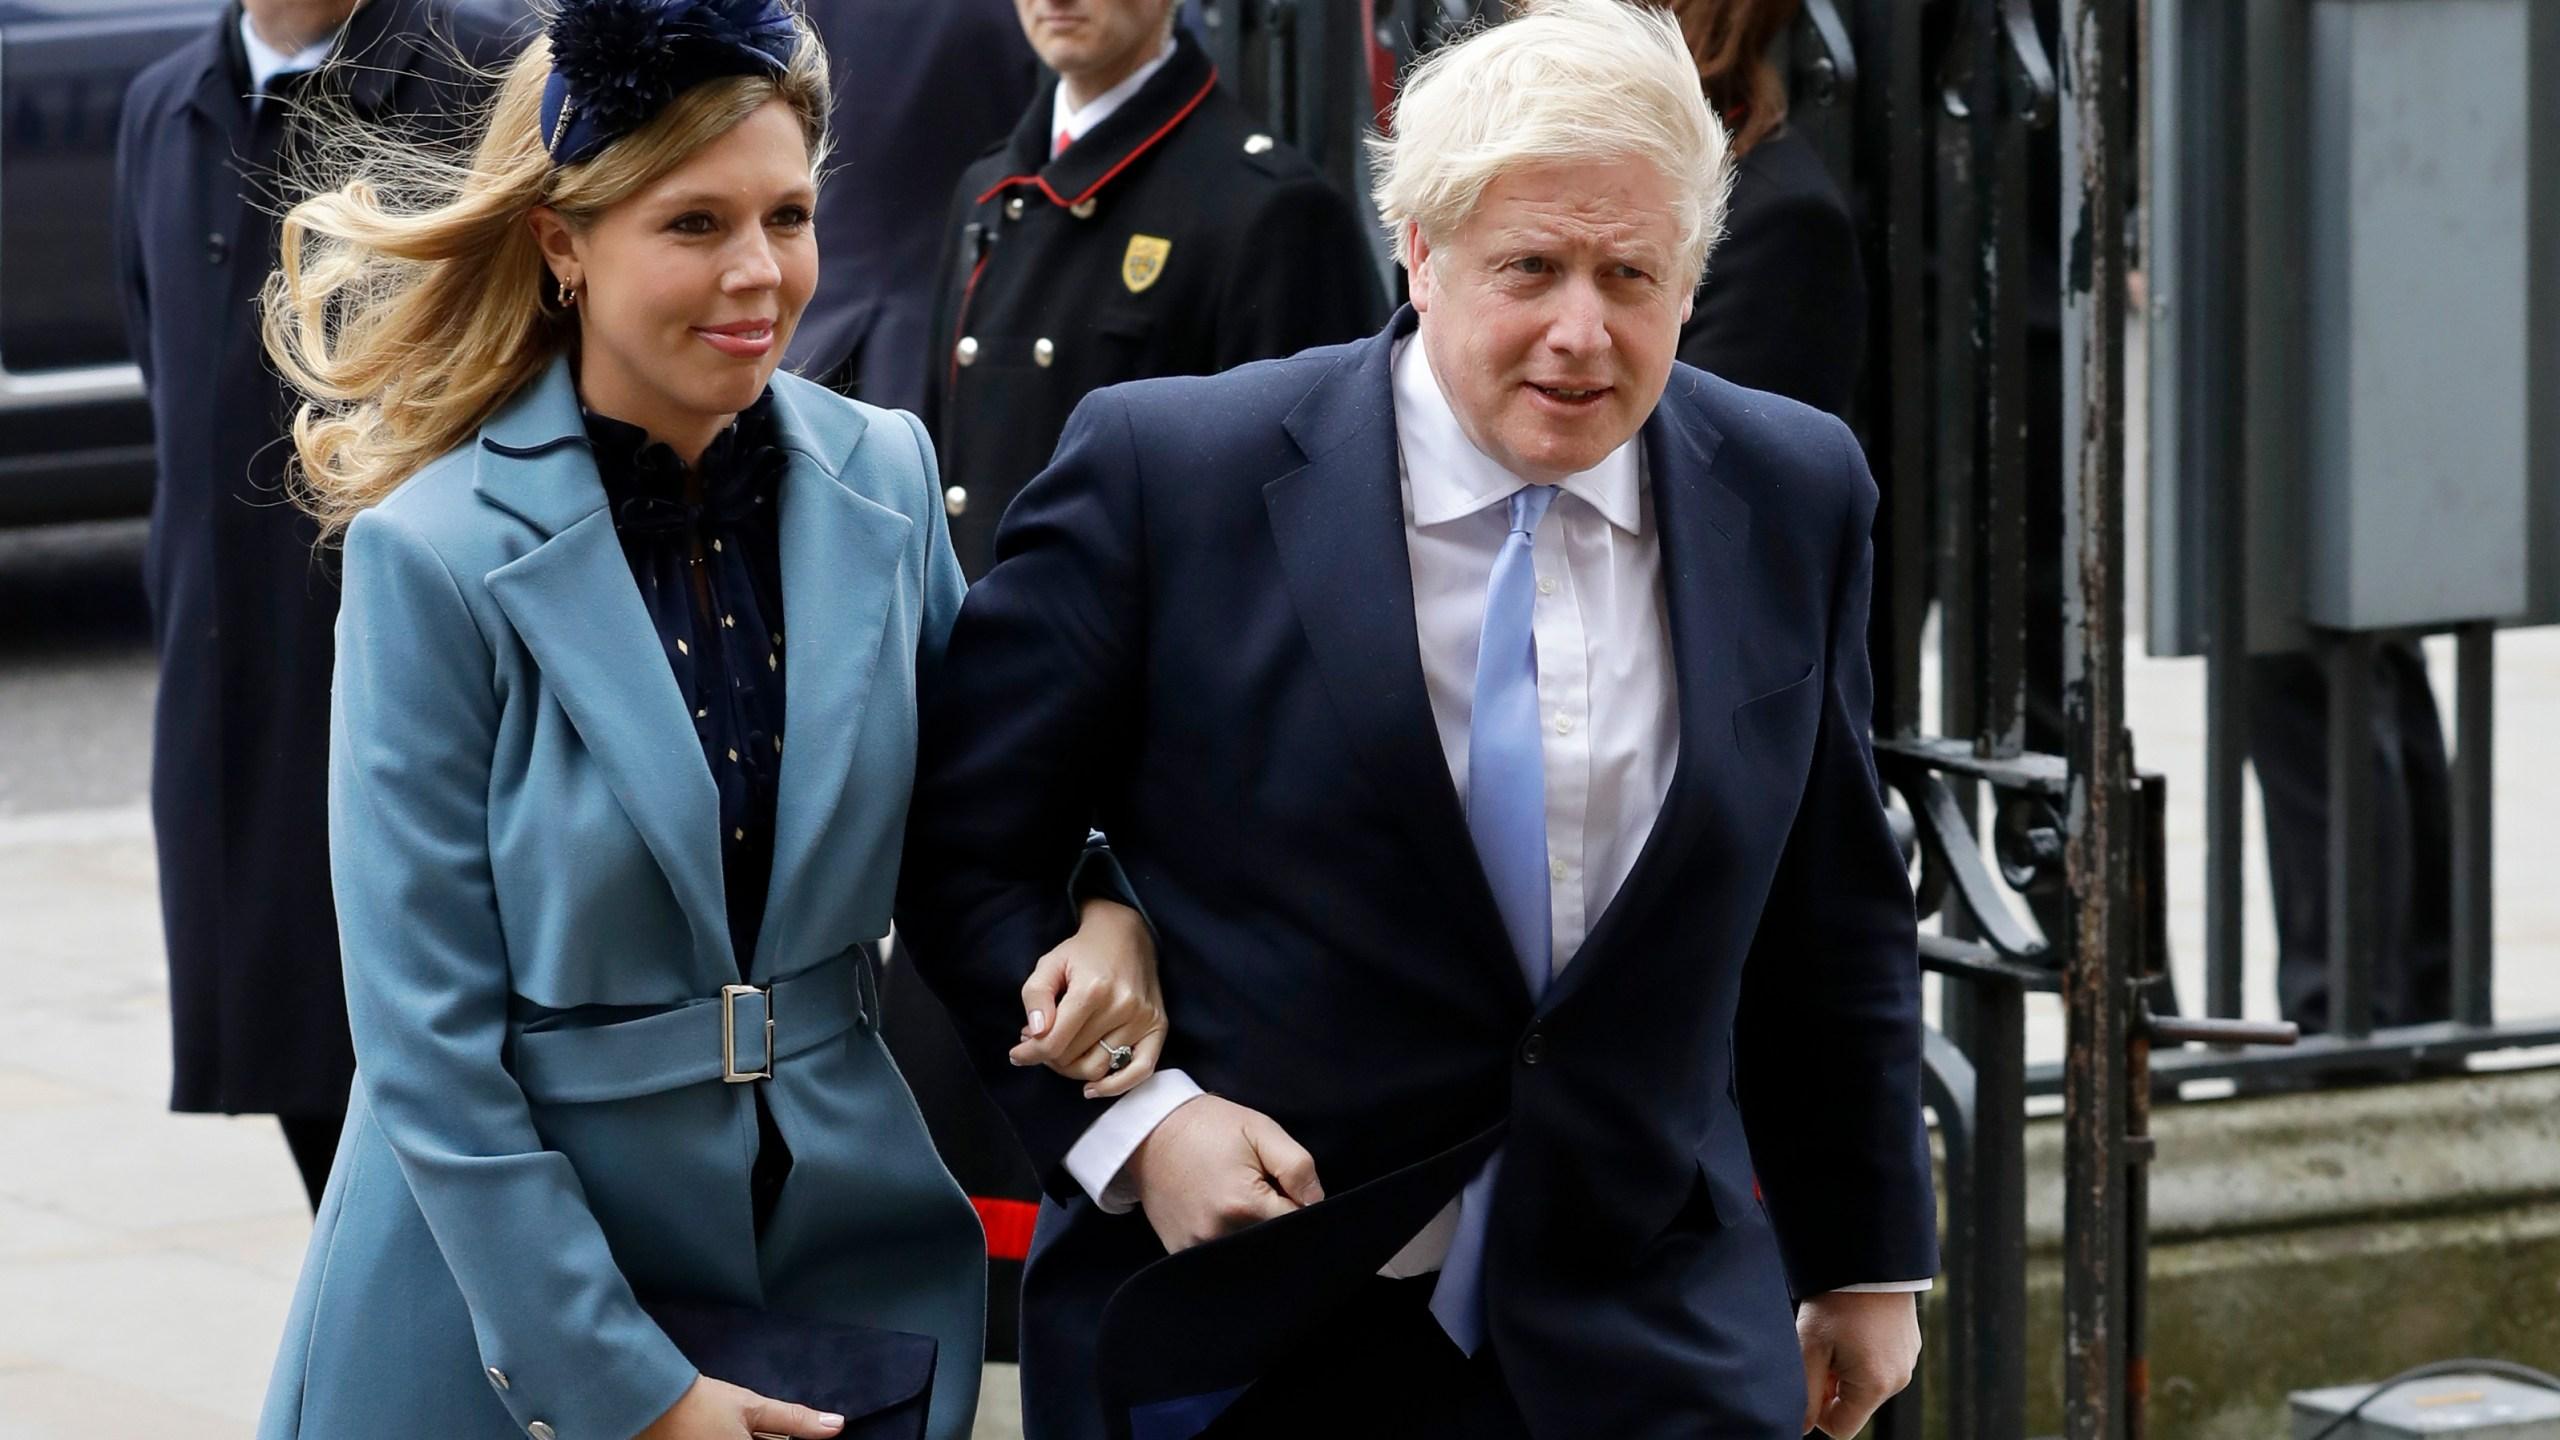 Boris Johnson, Carrie Symonds